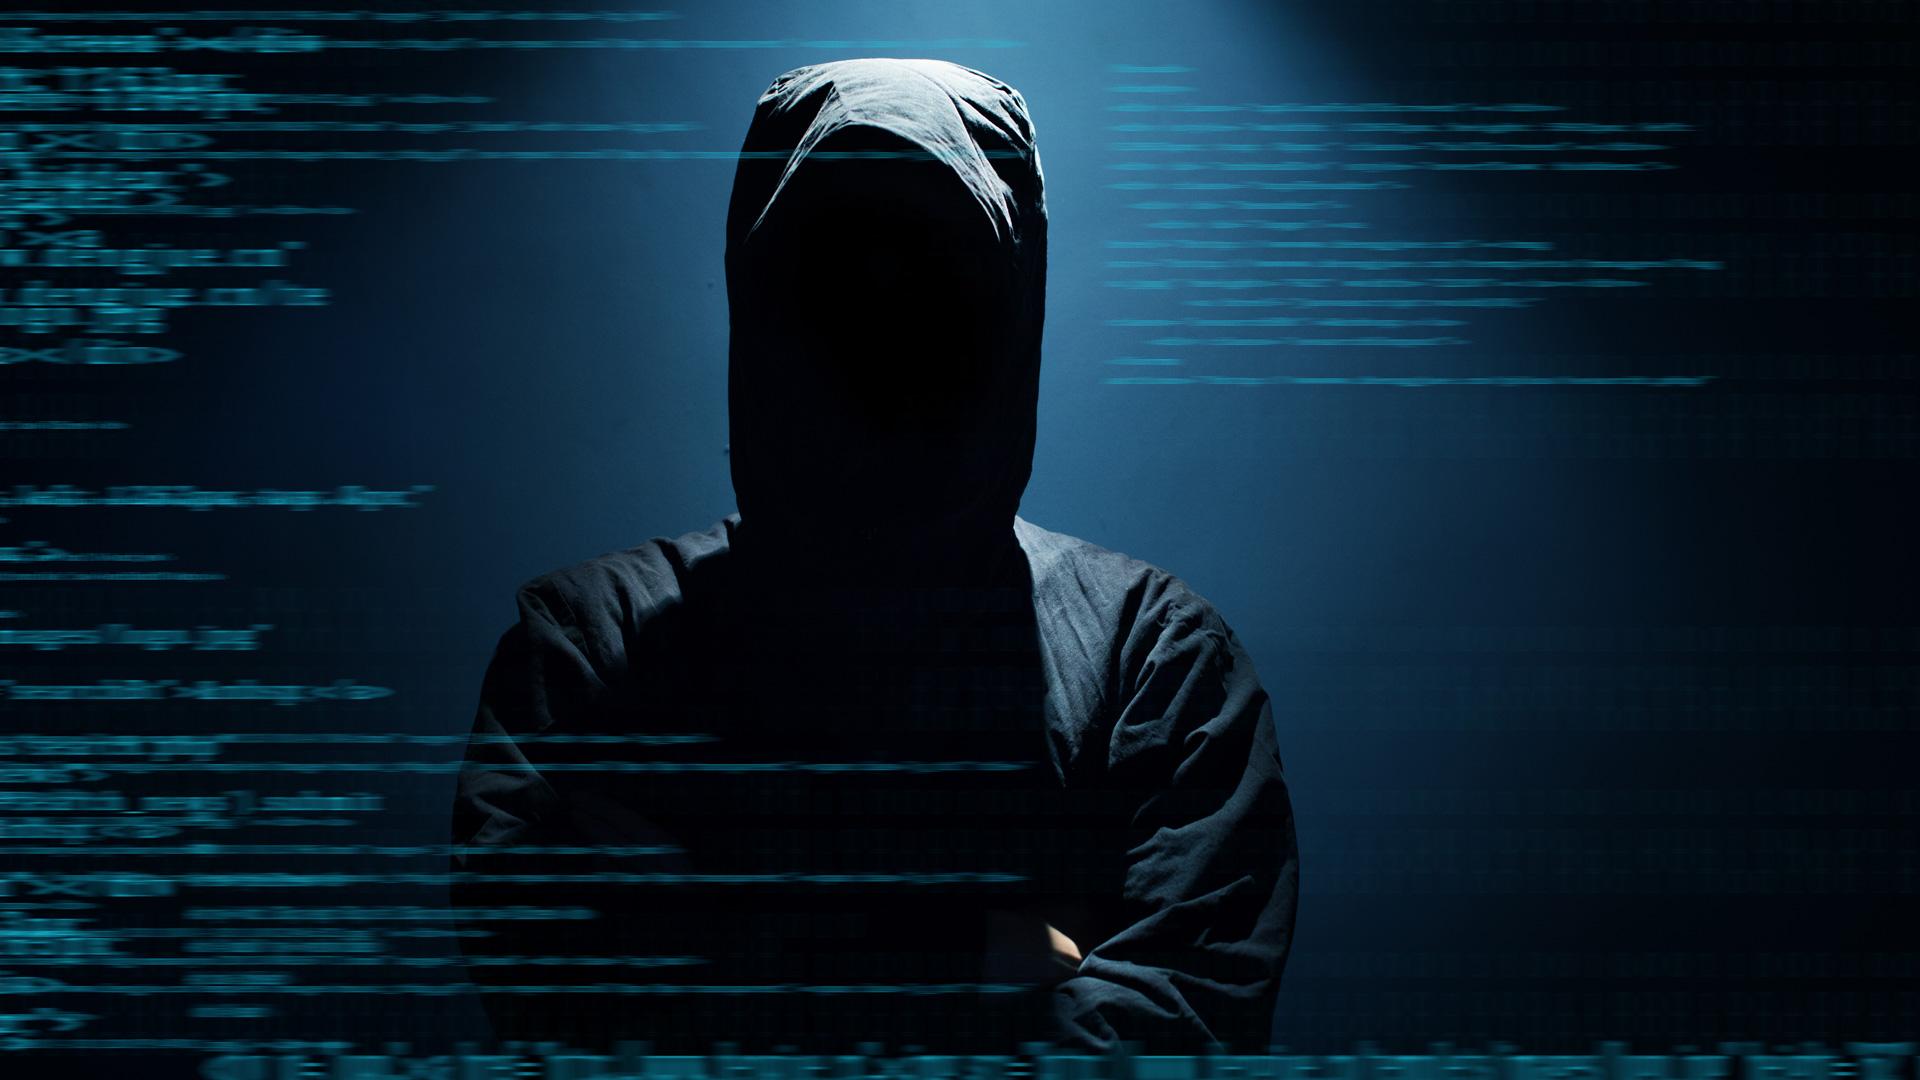 Хакер крутые картинки, для открытки квиллинг